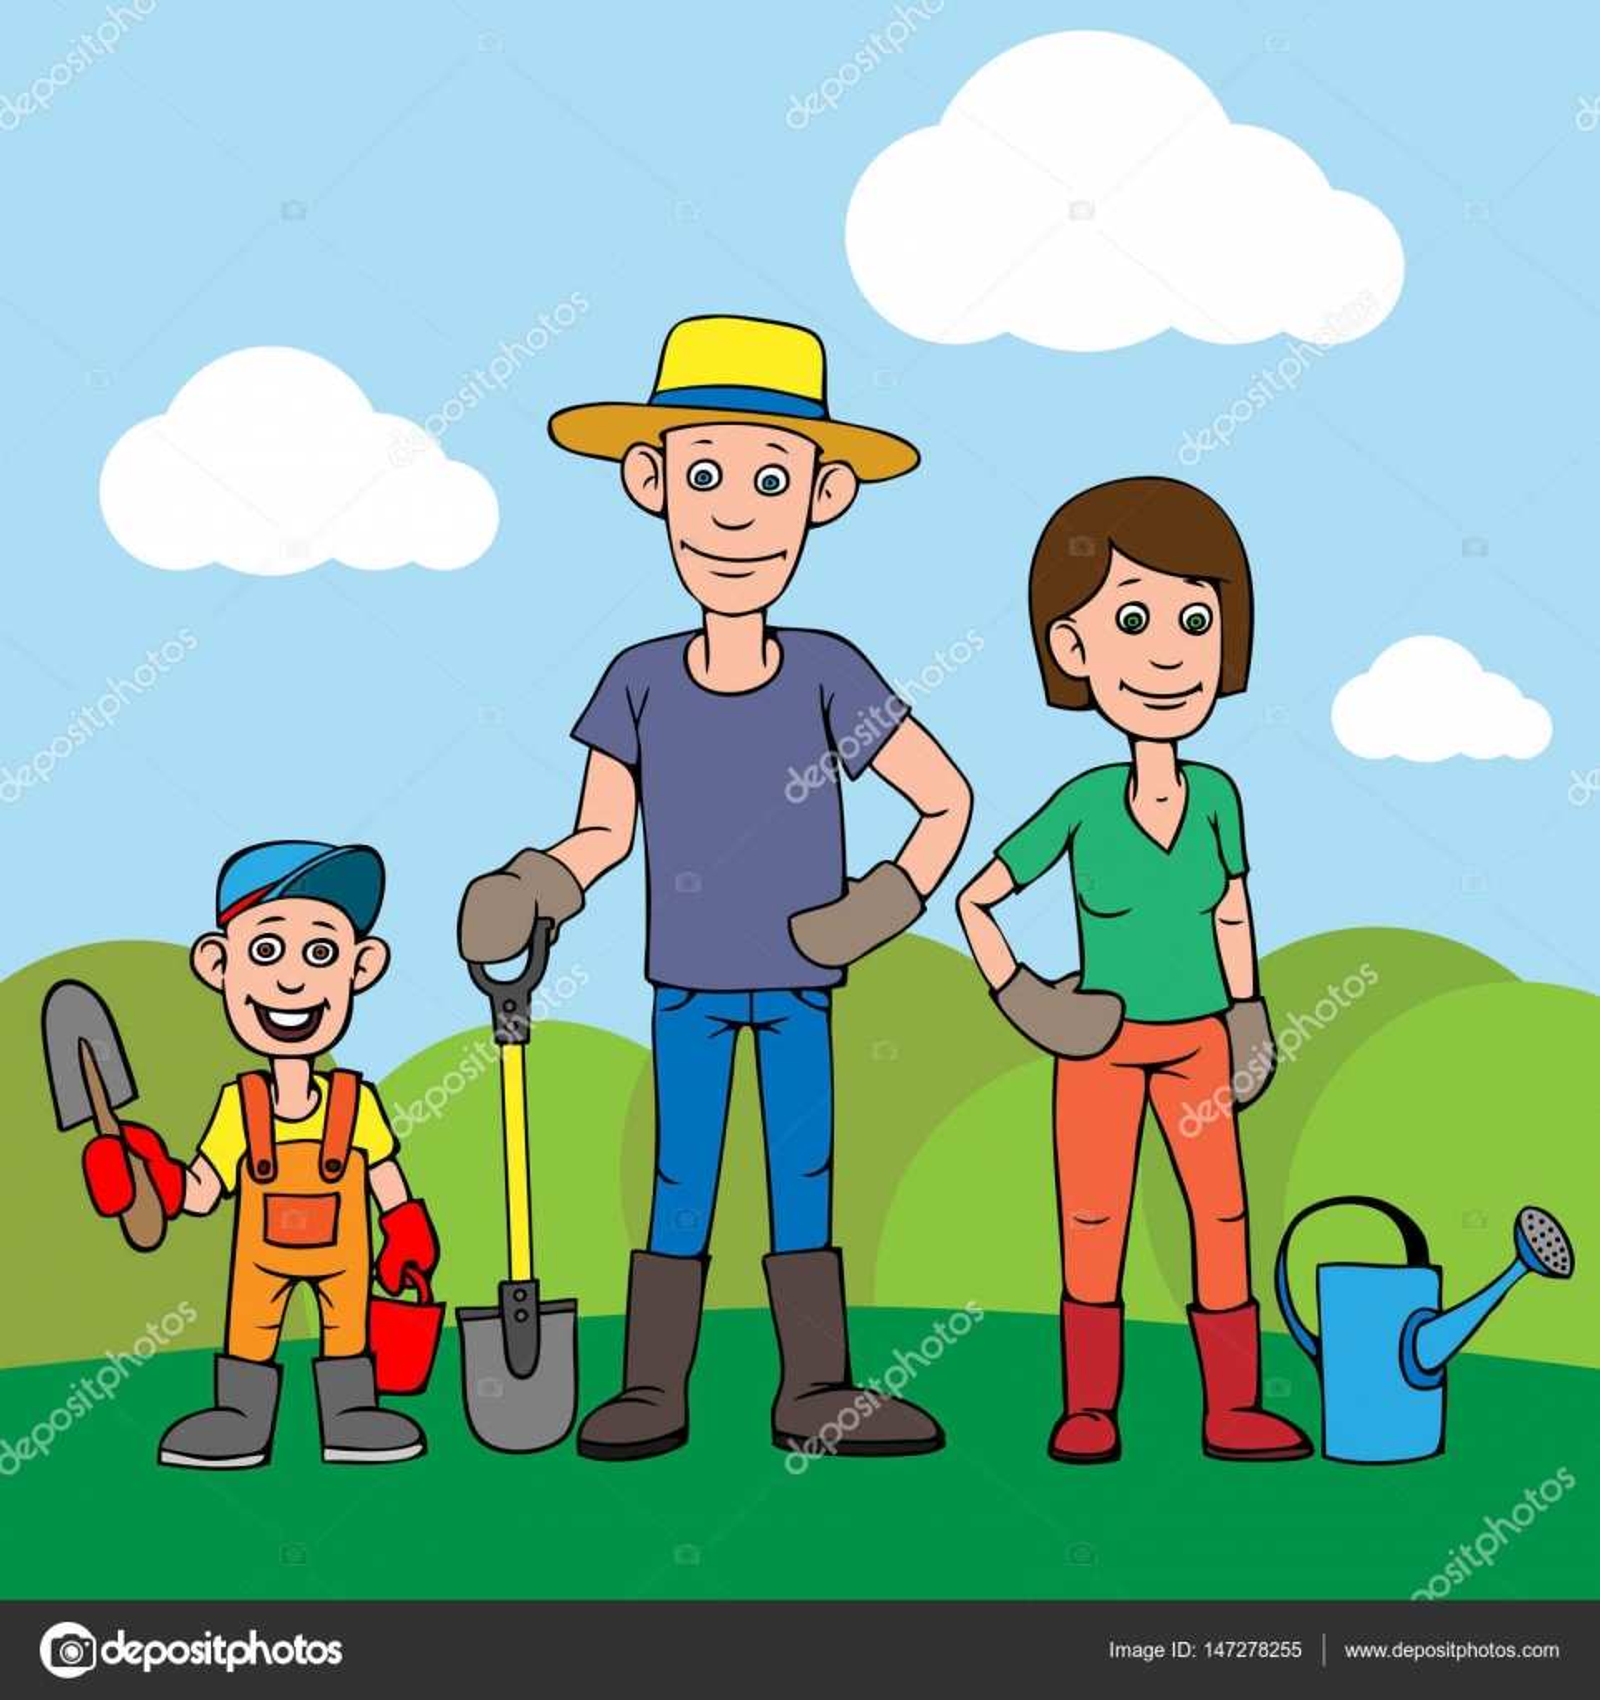 Animado Niño Trabajando Caricatura Una Joven Familia Padre